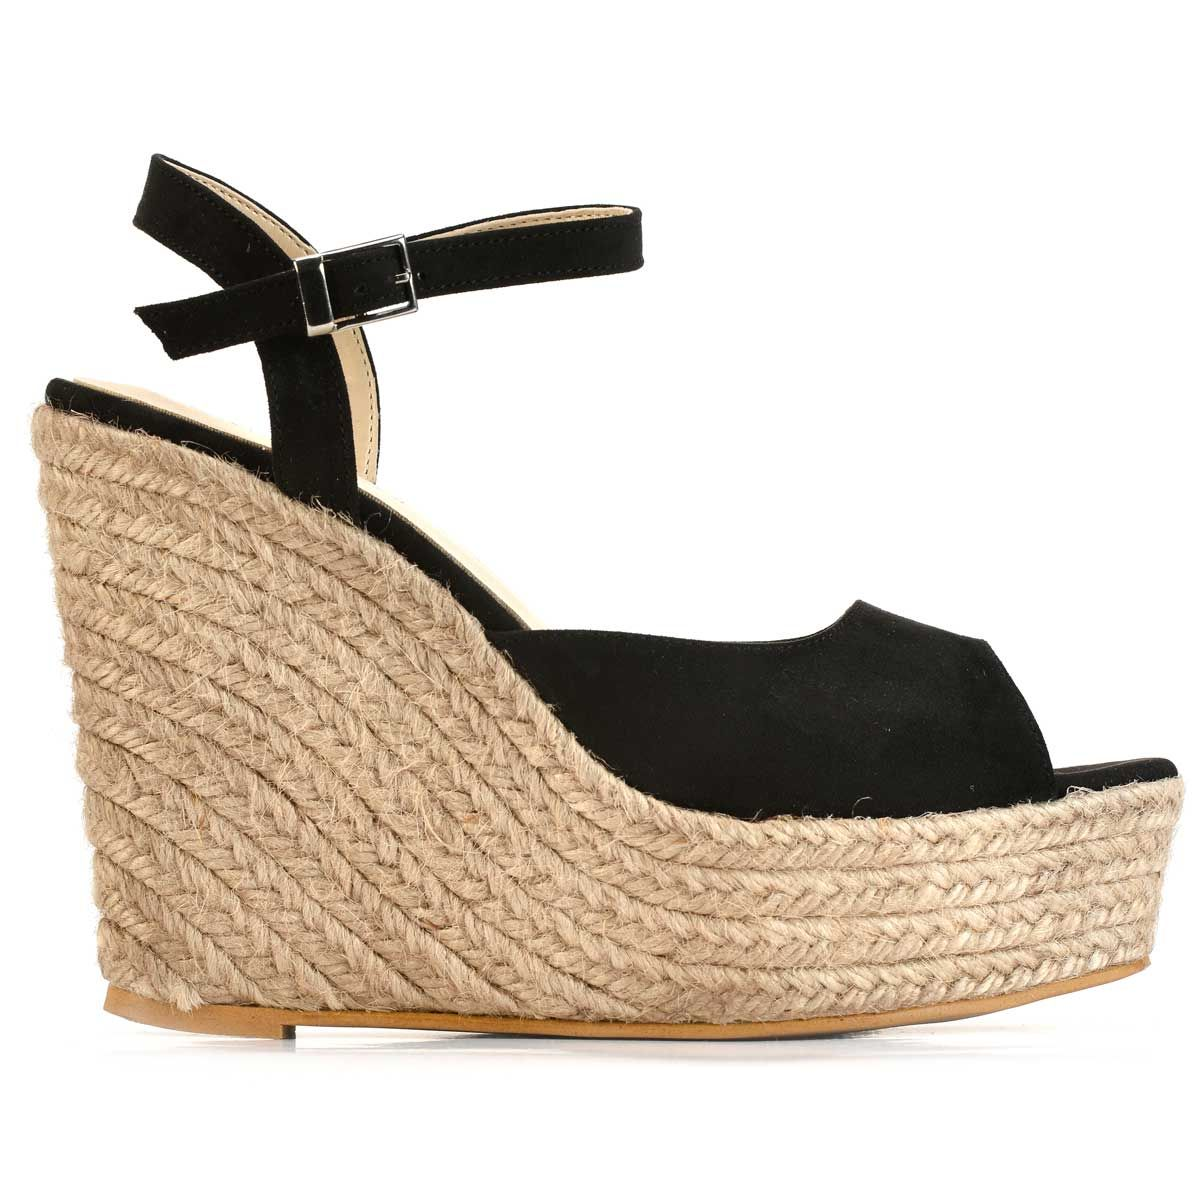 Montevita Ankle Strap Wedge Espadrille in Black